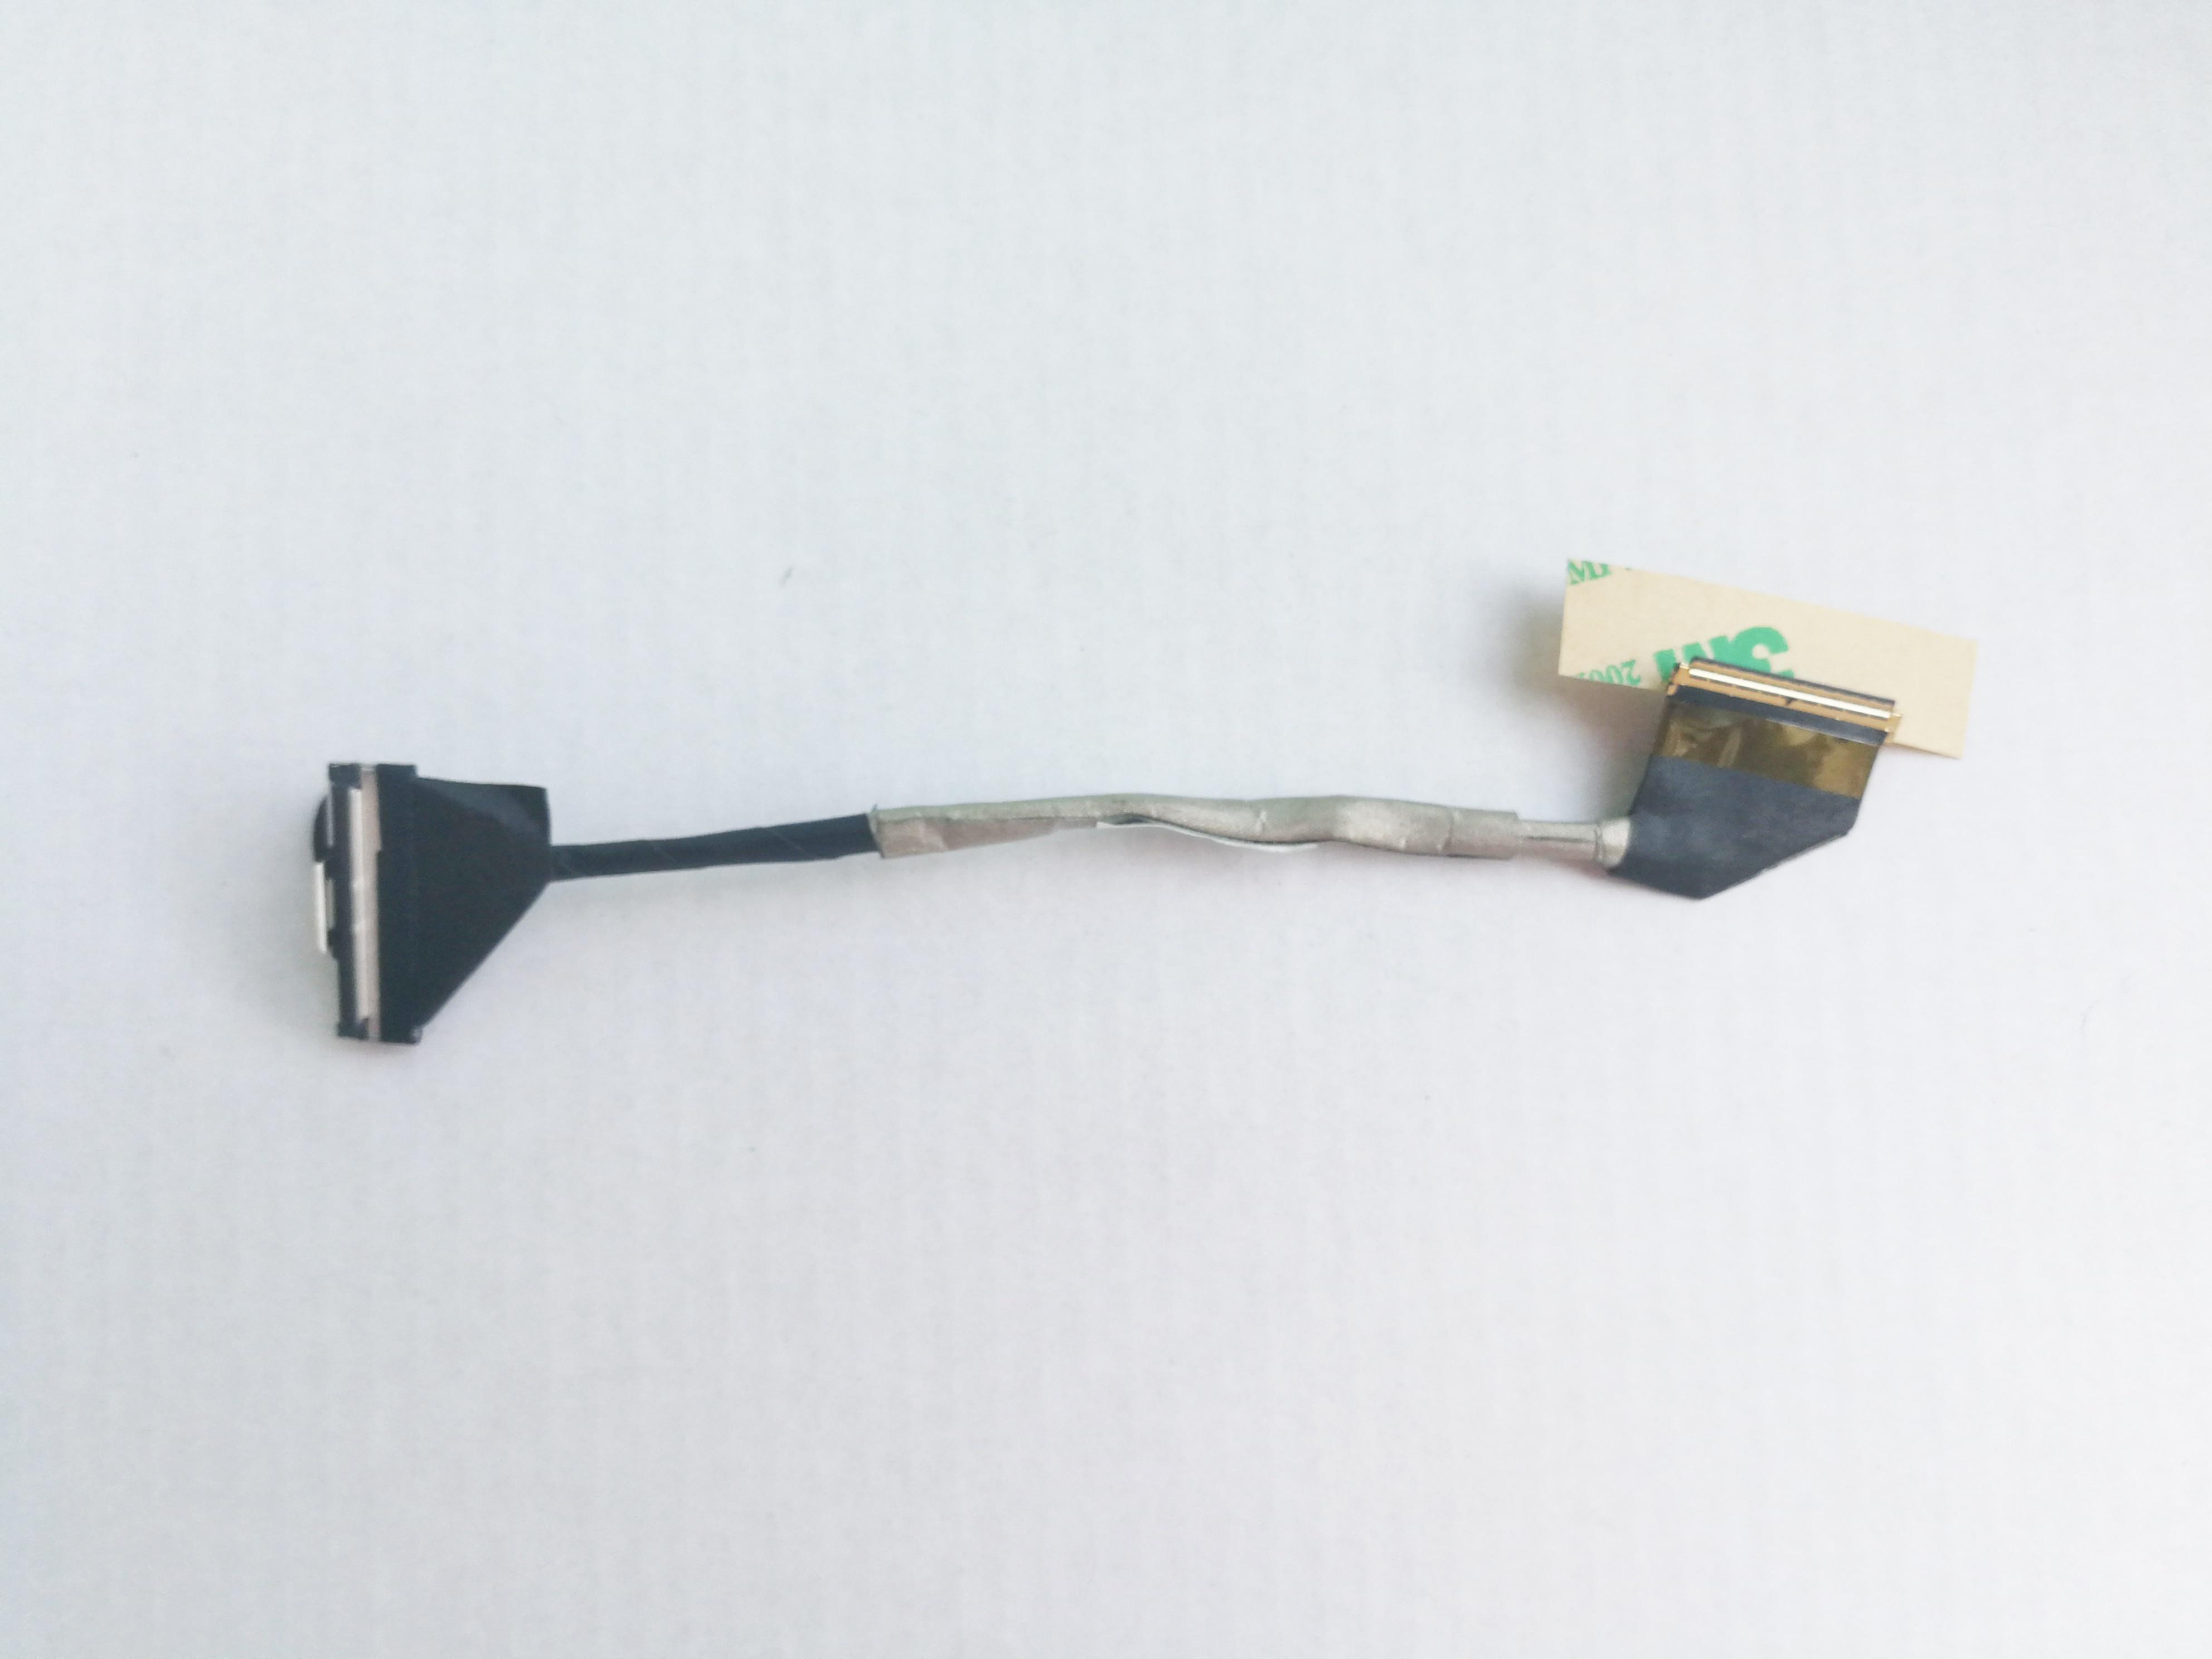 new original for Dell XPS 15 L521x QBL00 led lcd lvds cable DC02C002J00